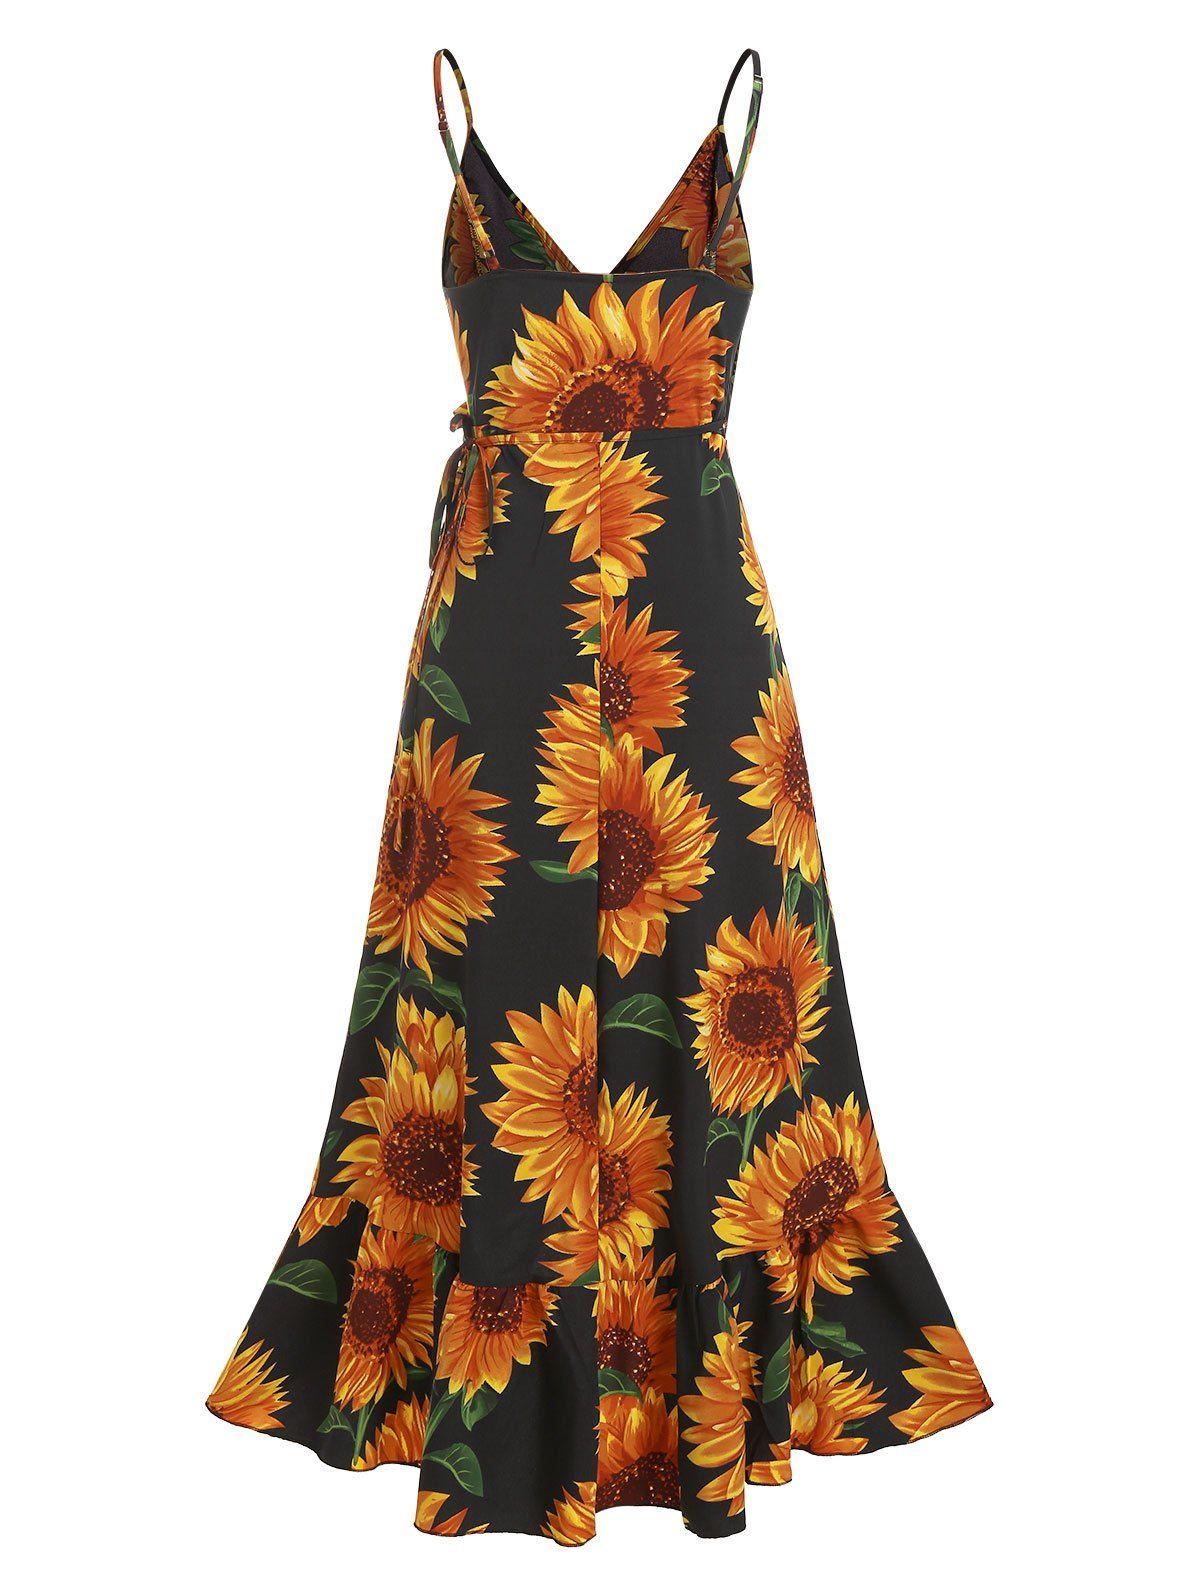 Sunflower Print Spaghetti Strap Wrap Maxi Dress Ad Affiliate Spaghetti Print Sunflower Strap Dress In 2020 Maxi Wrap Dress Dresses Summer Dresses [ 1596 x 1200 Pixel ]